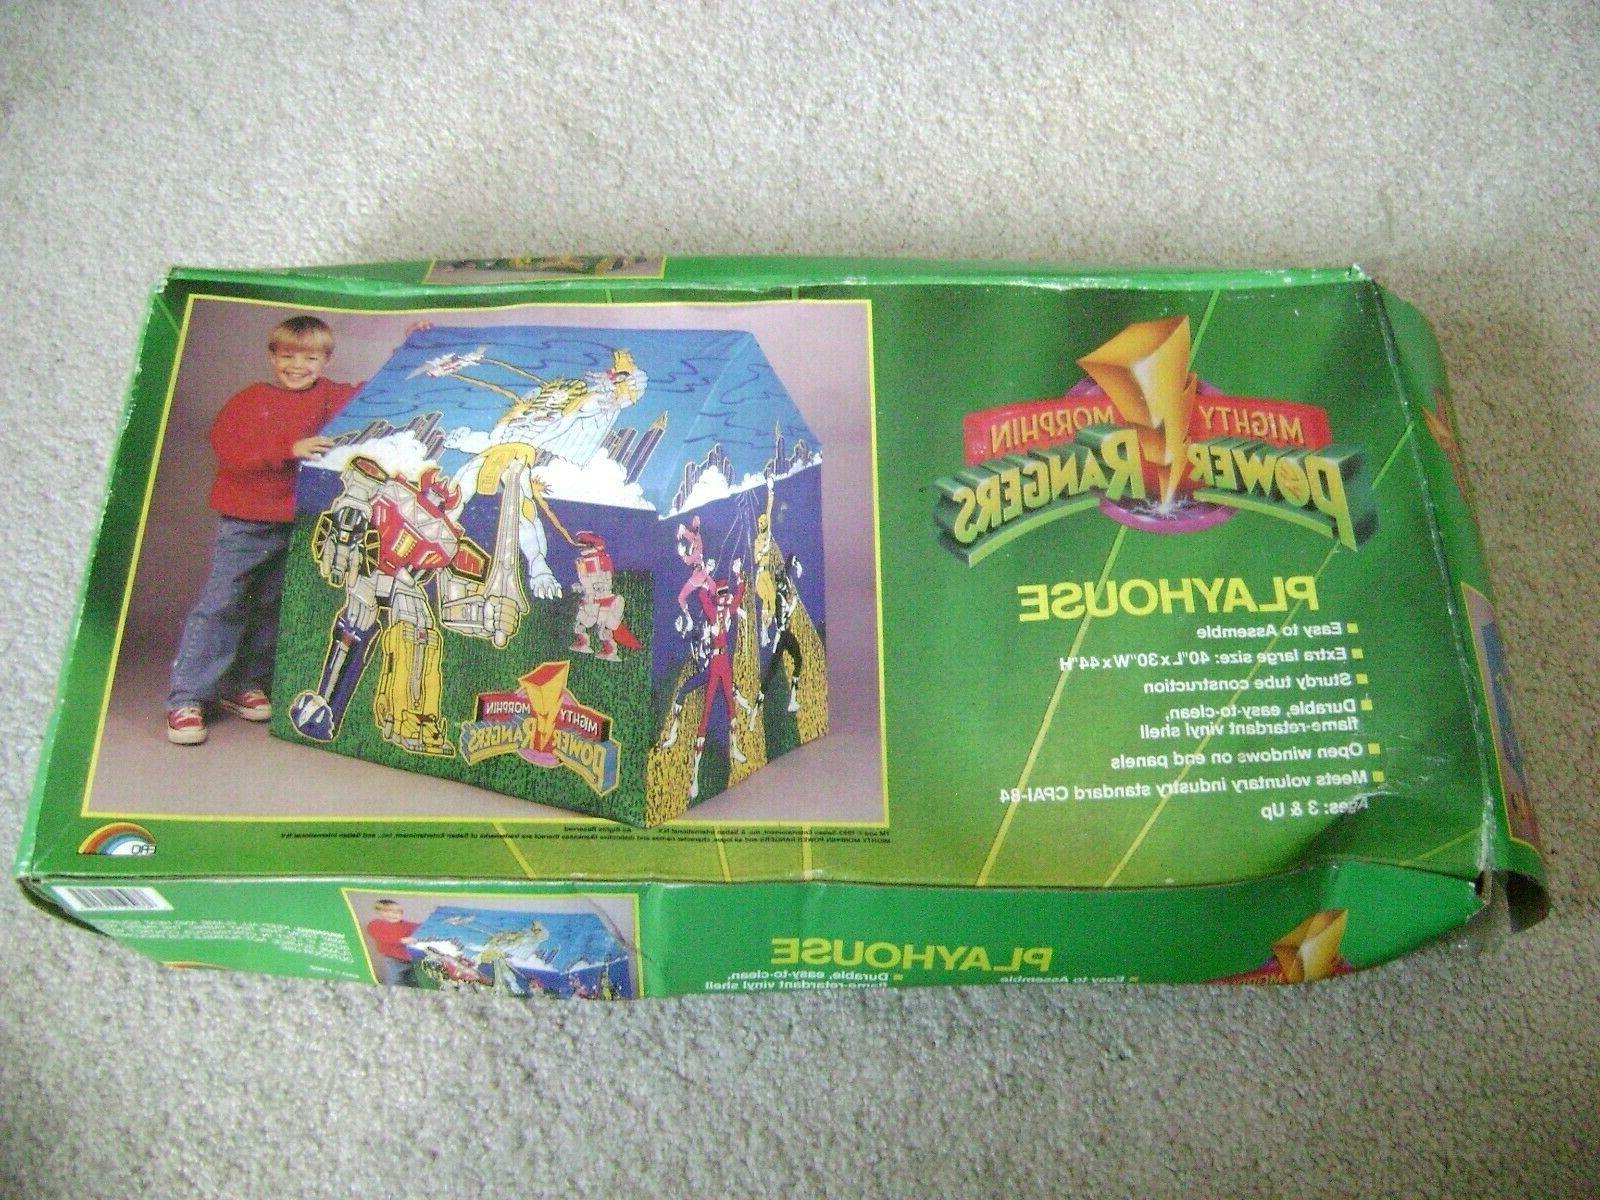 Mighty Morphin Playhouse 1993